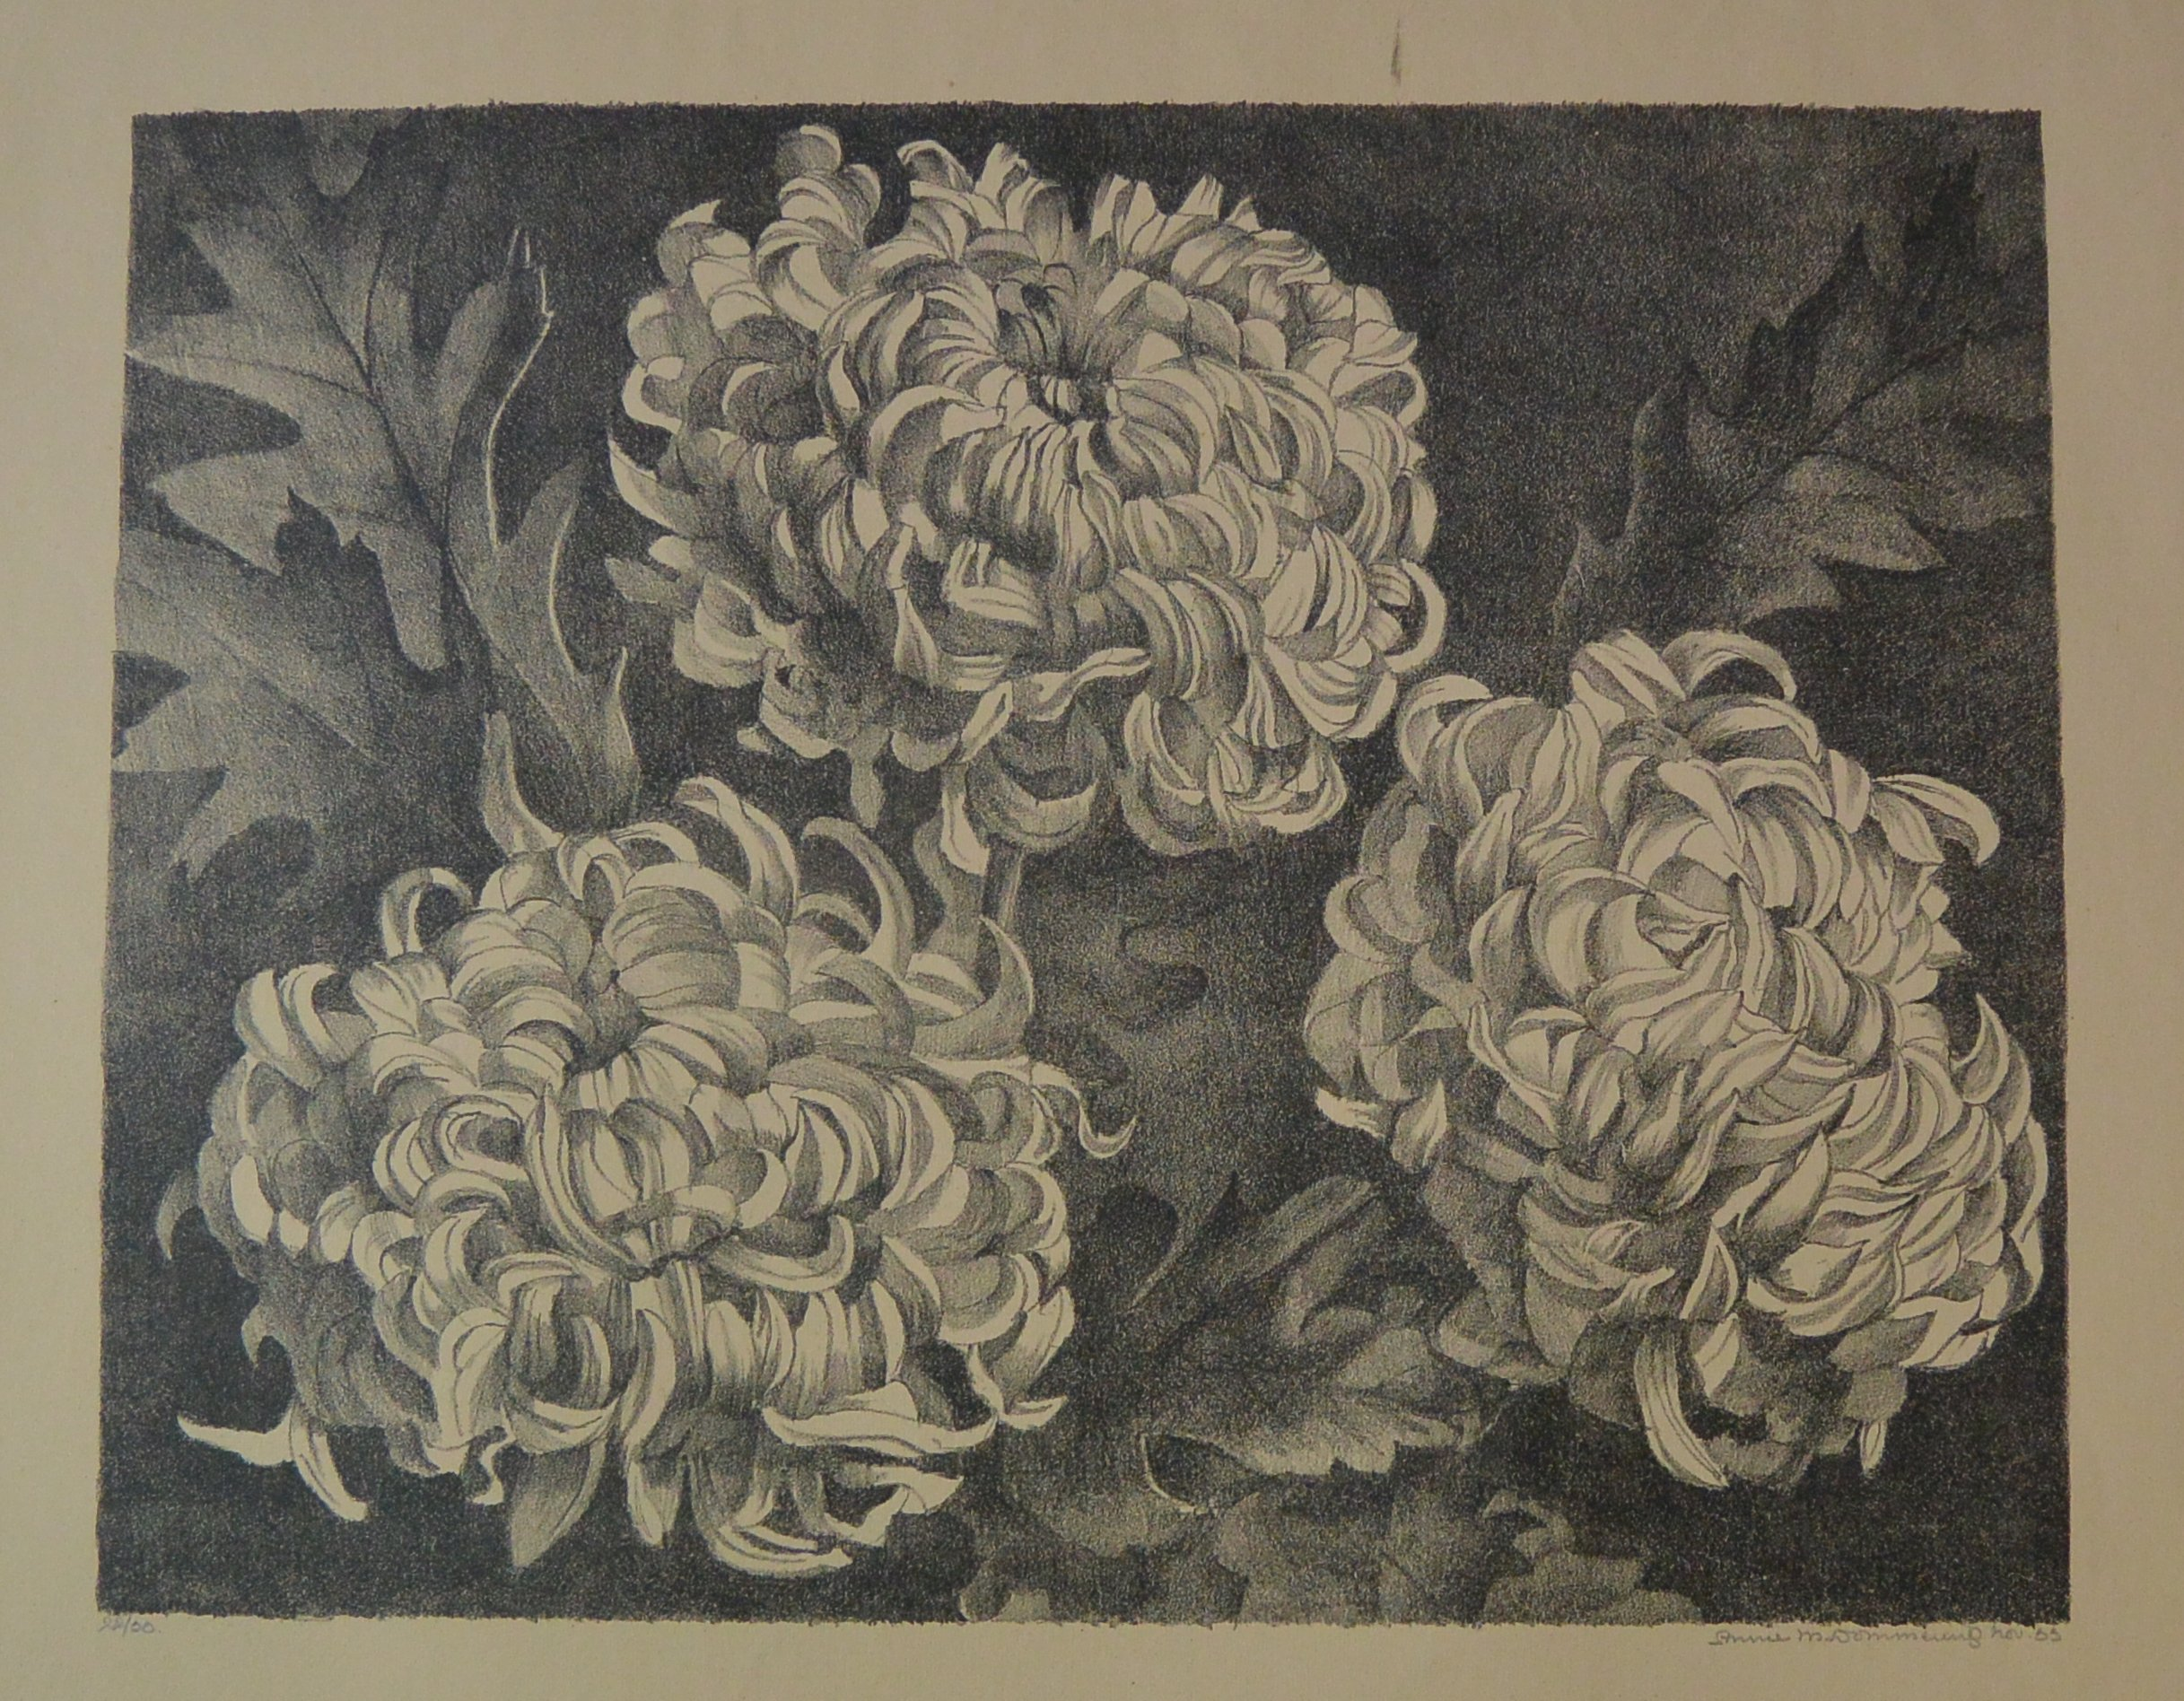 Bloemen-002 Annie van Dommering, Drie grote pioenrozen